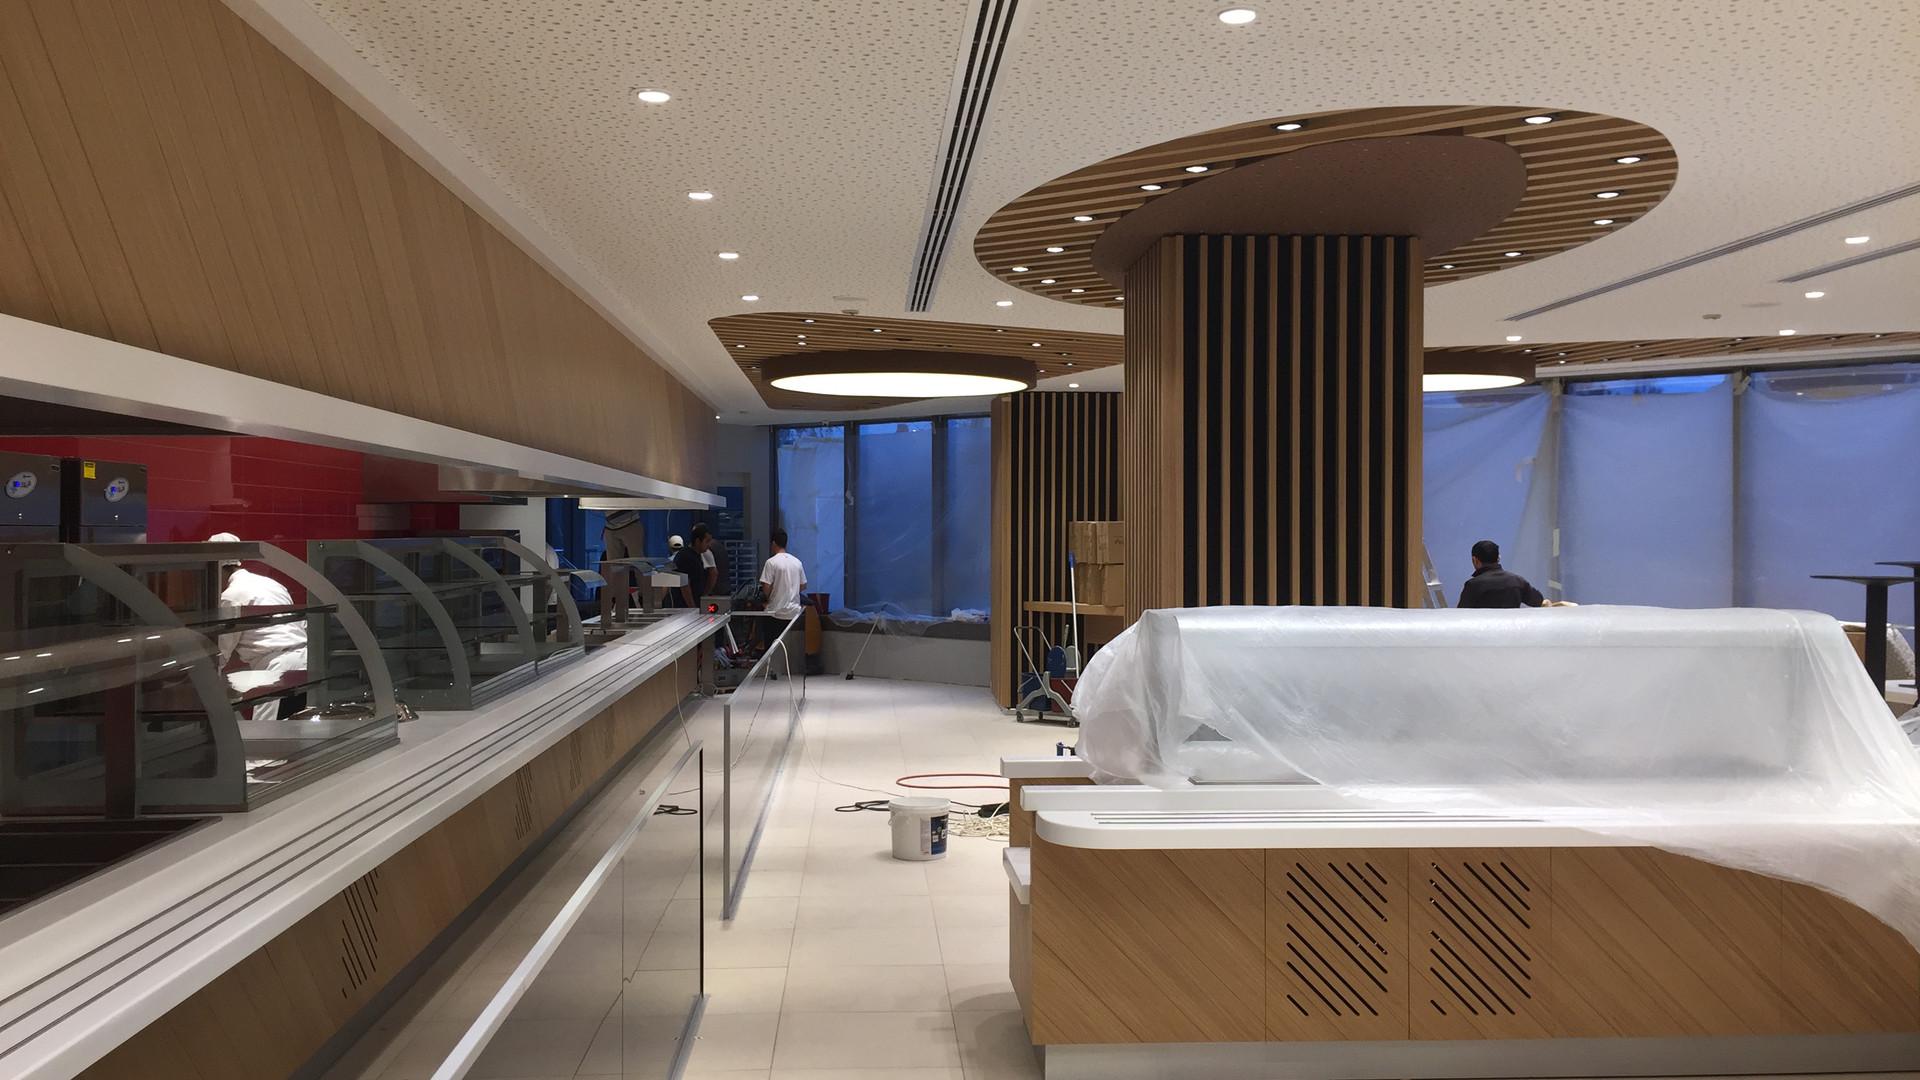 Hürriyet Restaurant - Acoustic Design